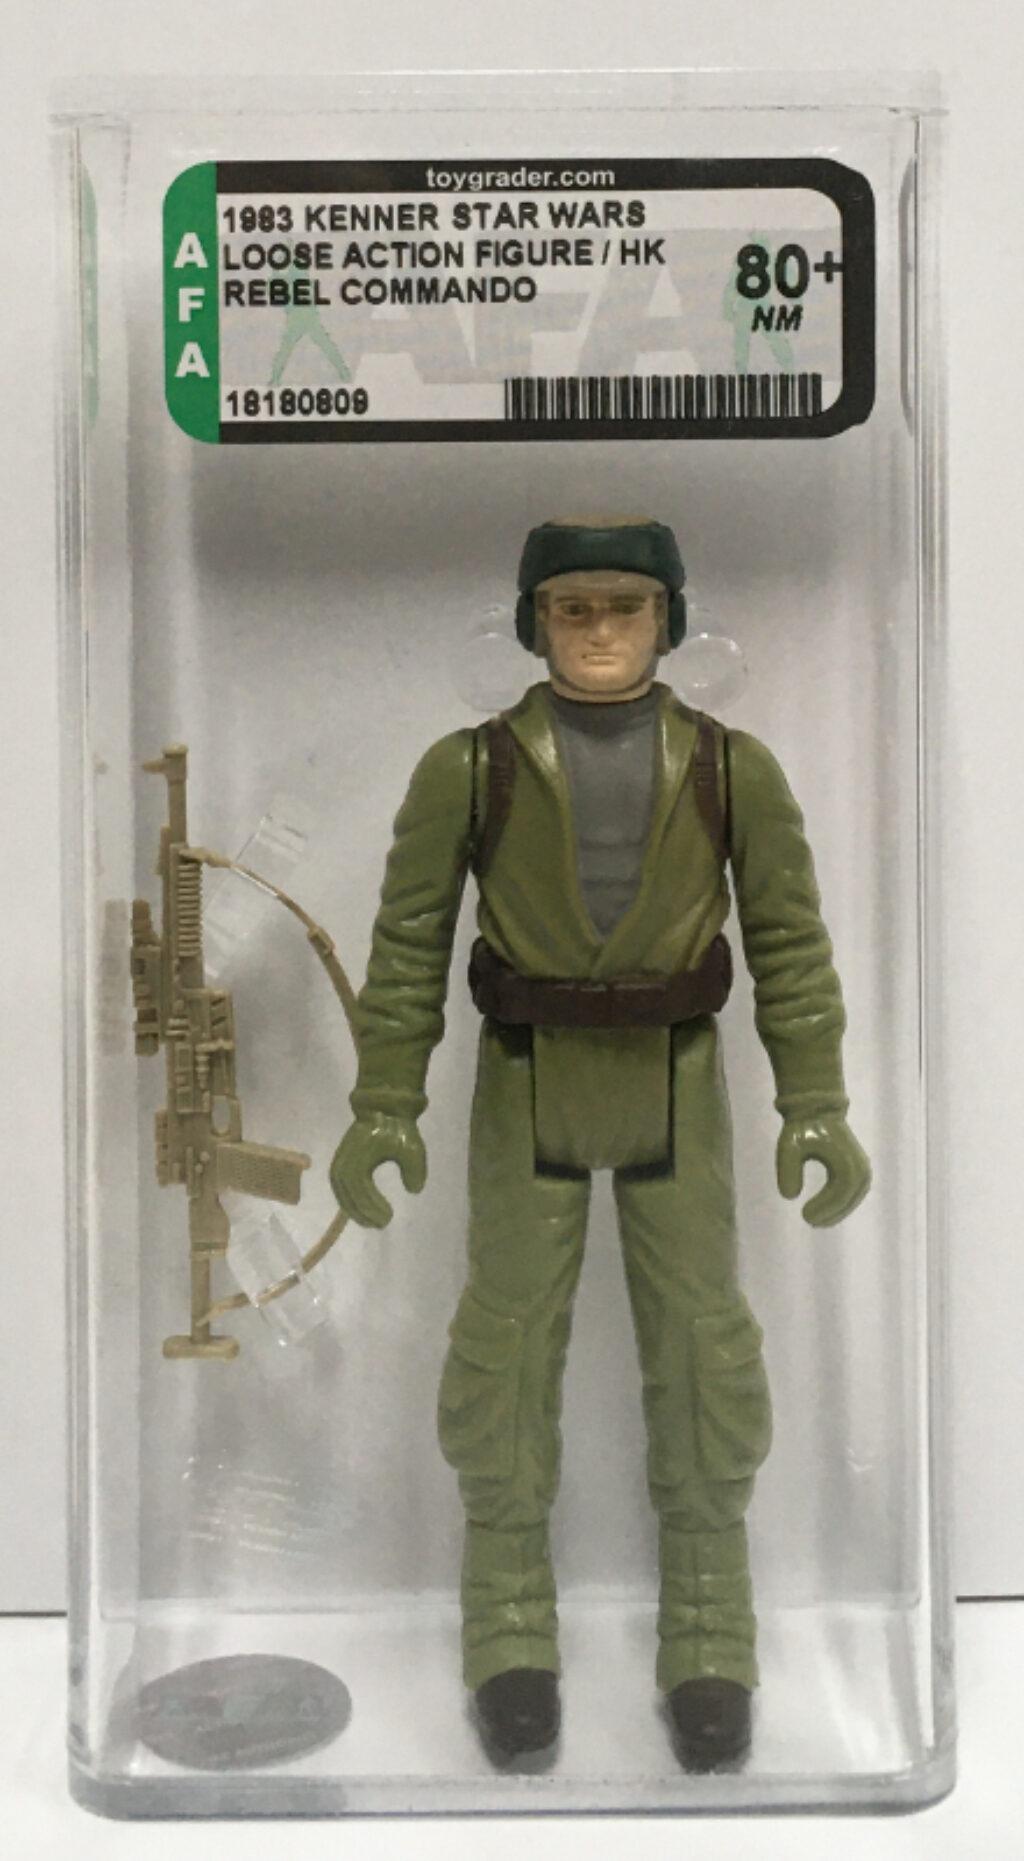 afa graded kenner star wars rebel commando 1